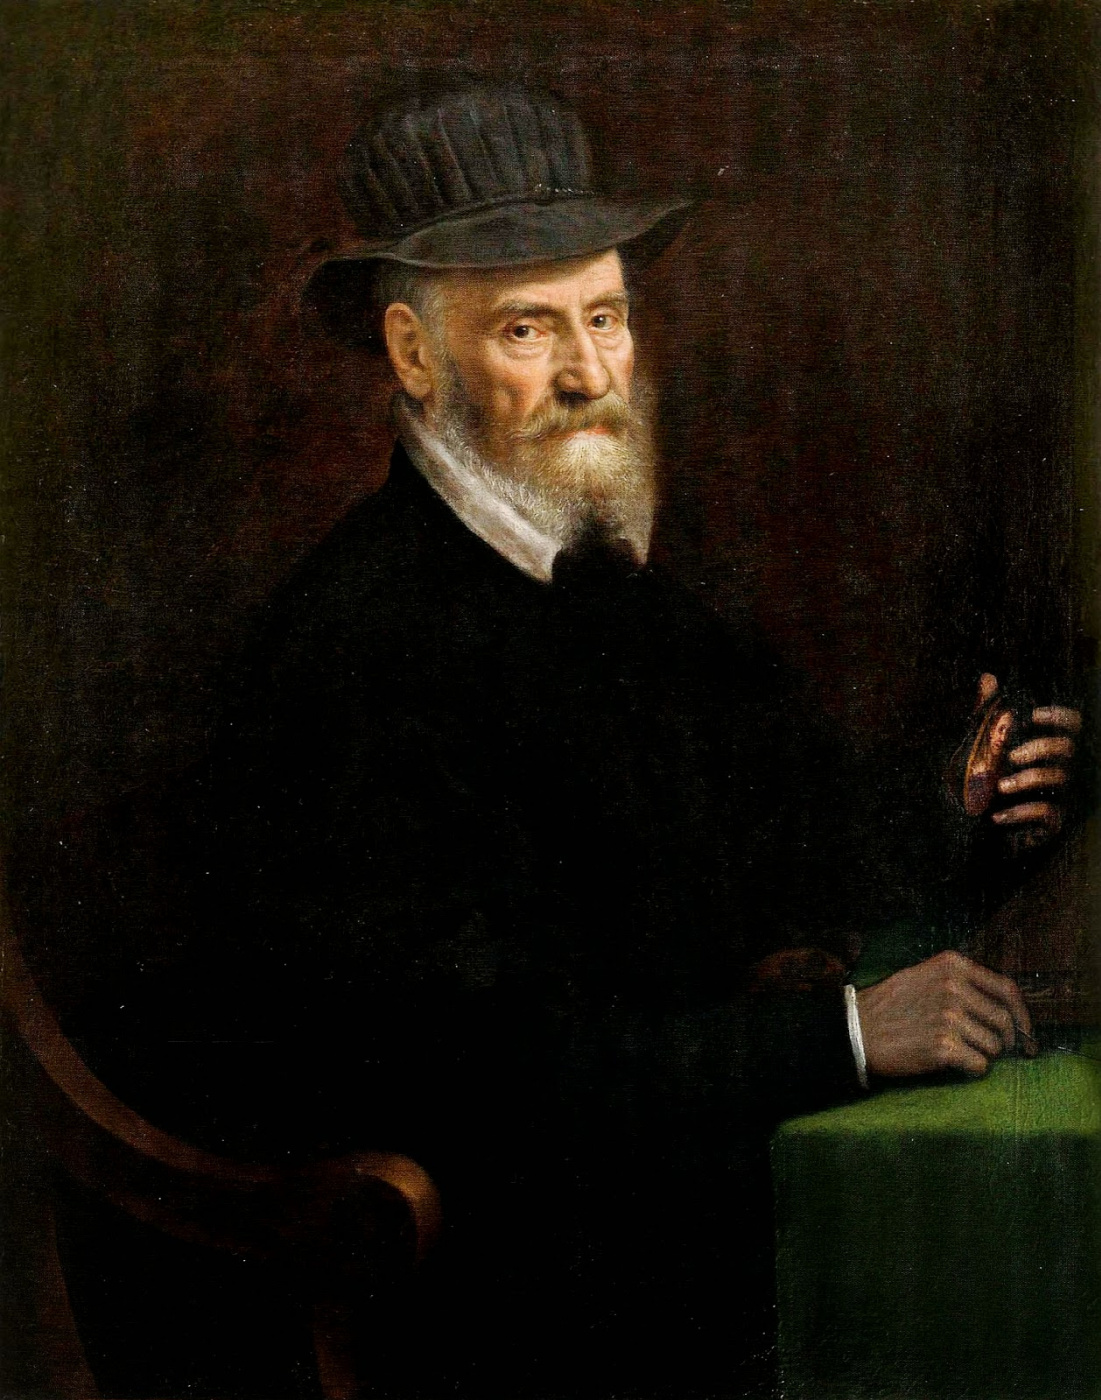 Sofonisba Angisola. Julio Clovio, master of artistic miniatures